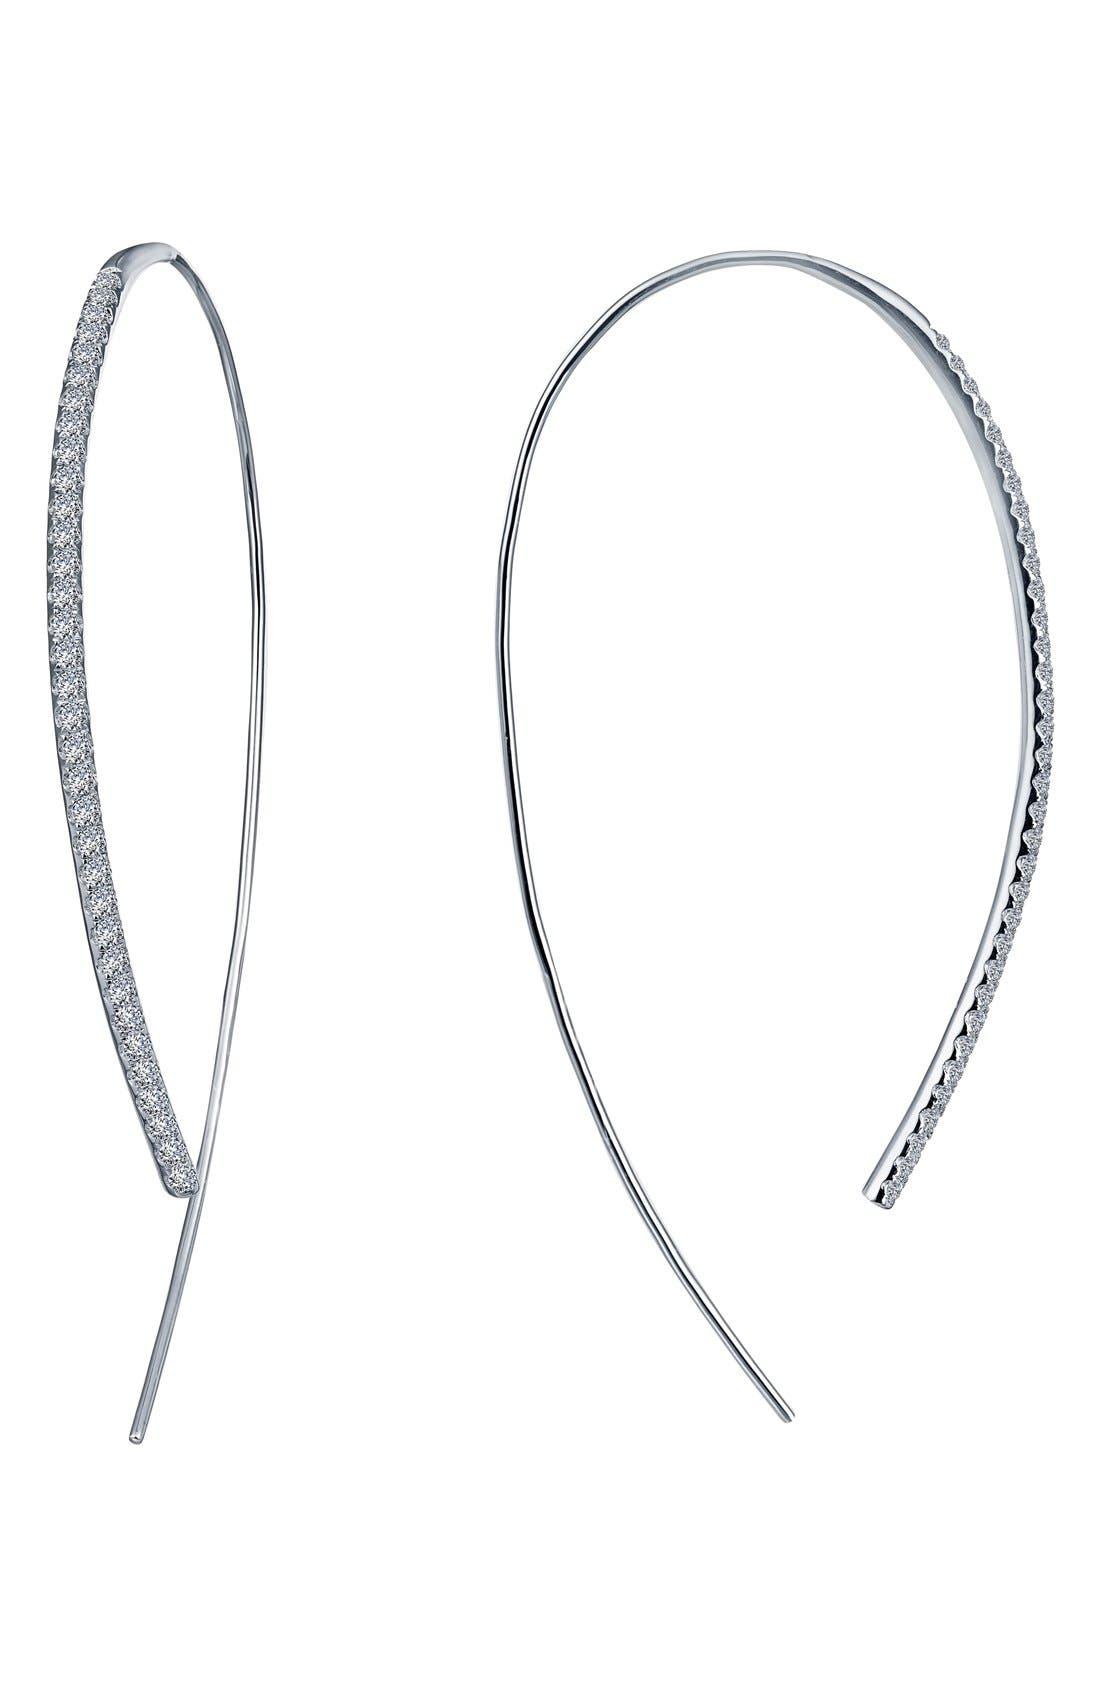 Main Image - Lafonn Open Hoop Threader Earrings